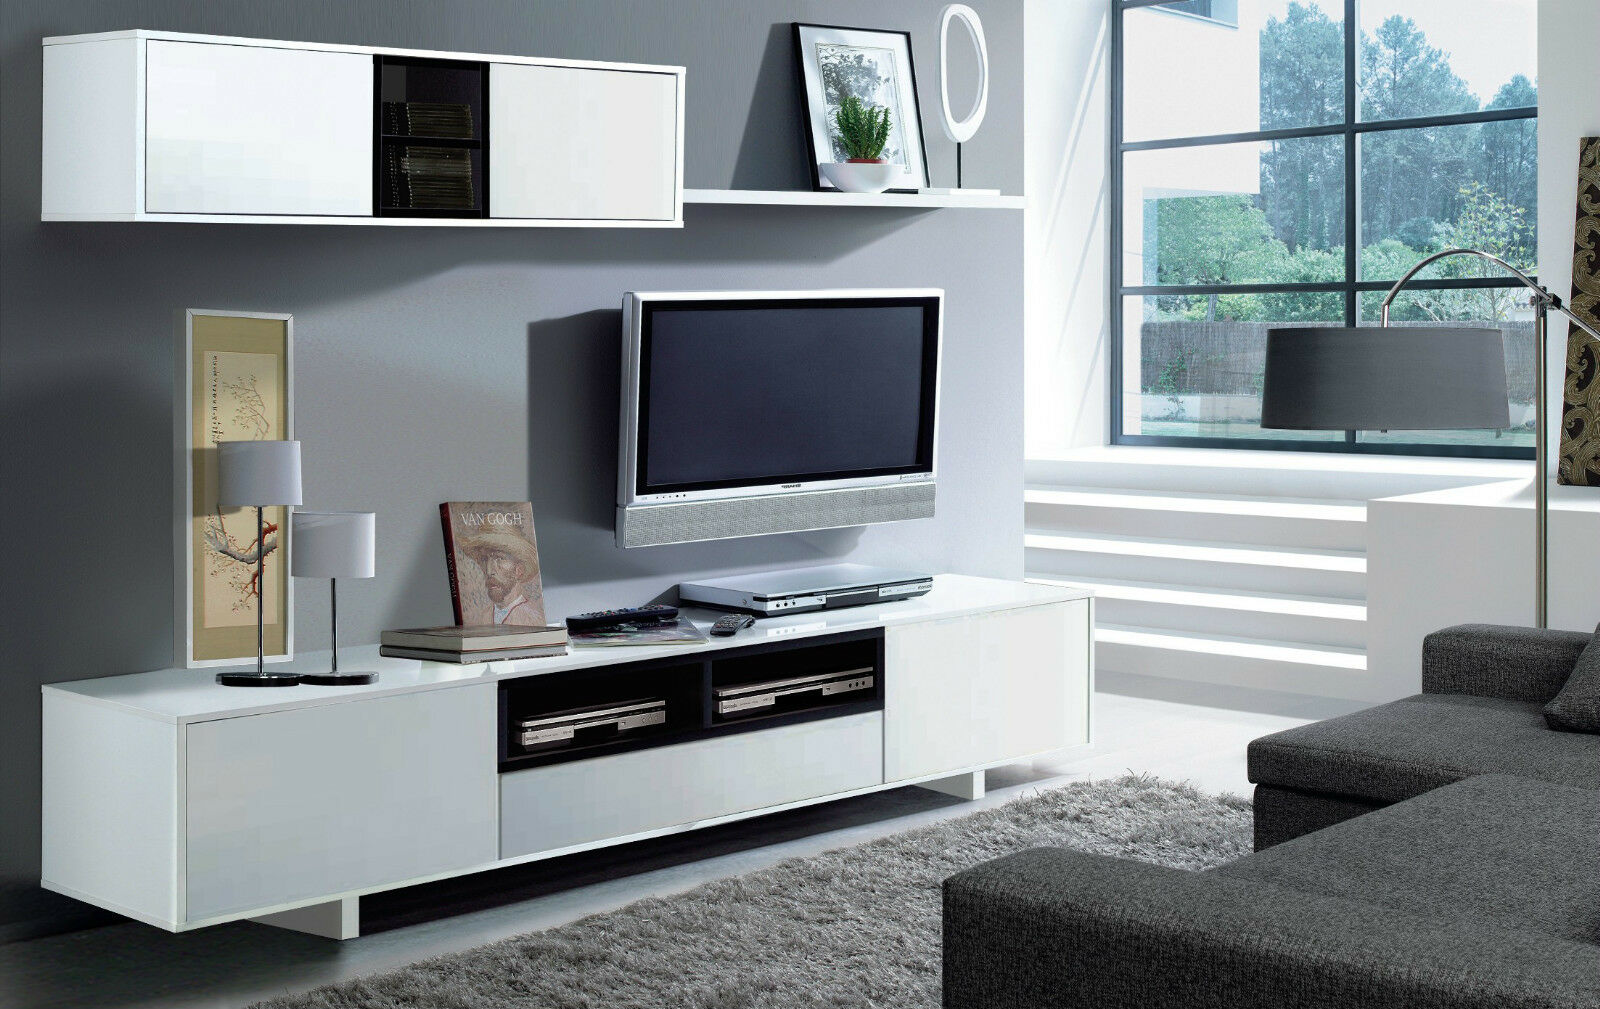 modern complete wall tv entertainment unit cabinet grey. Black Bedroom Furniture Sets. Home Design Ideas